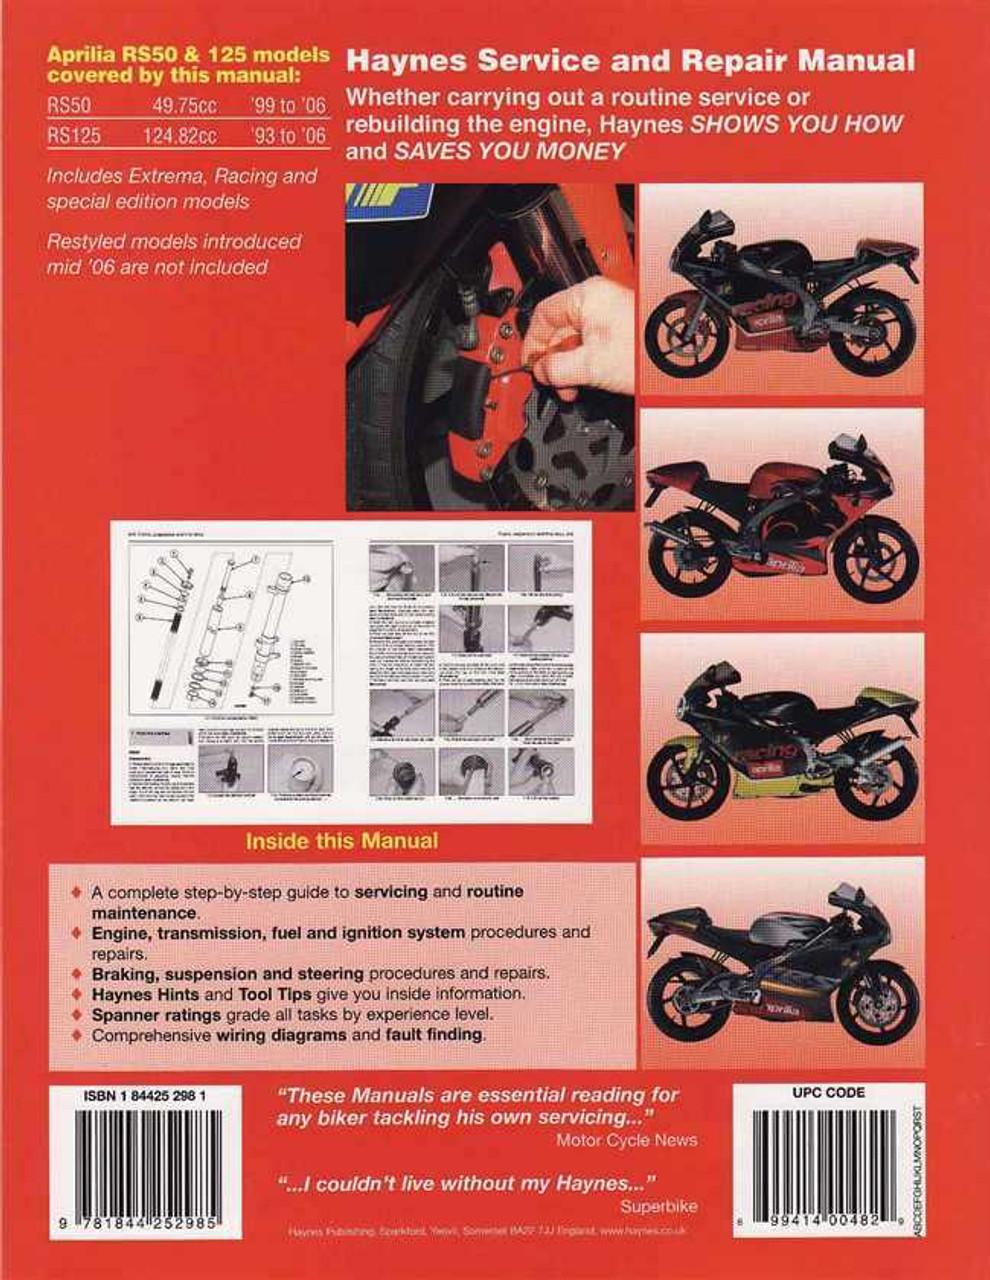 aprilia rs50 amp rs125 1993 2006 workshop manual rh automotobookshop com au aprilia rs 50 2009 manual aprilia rs 50 manual 2007